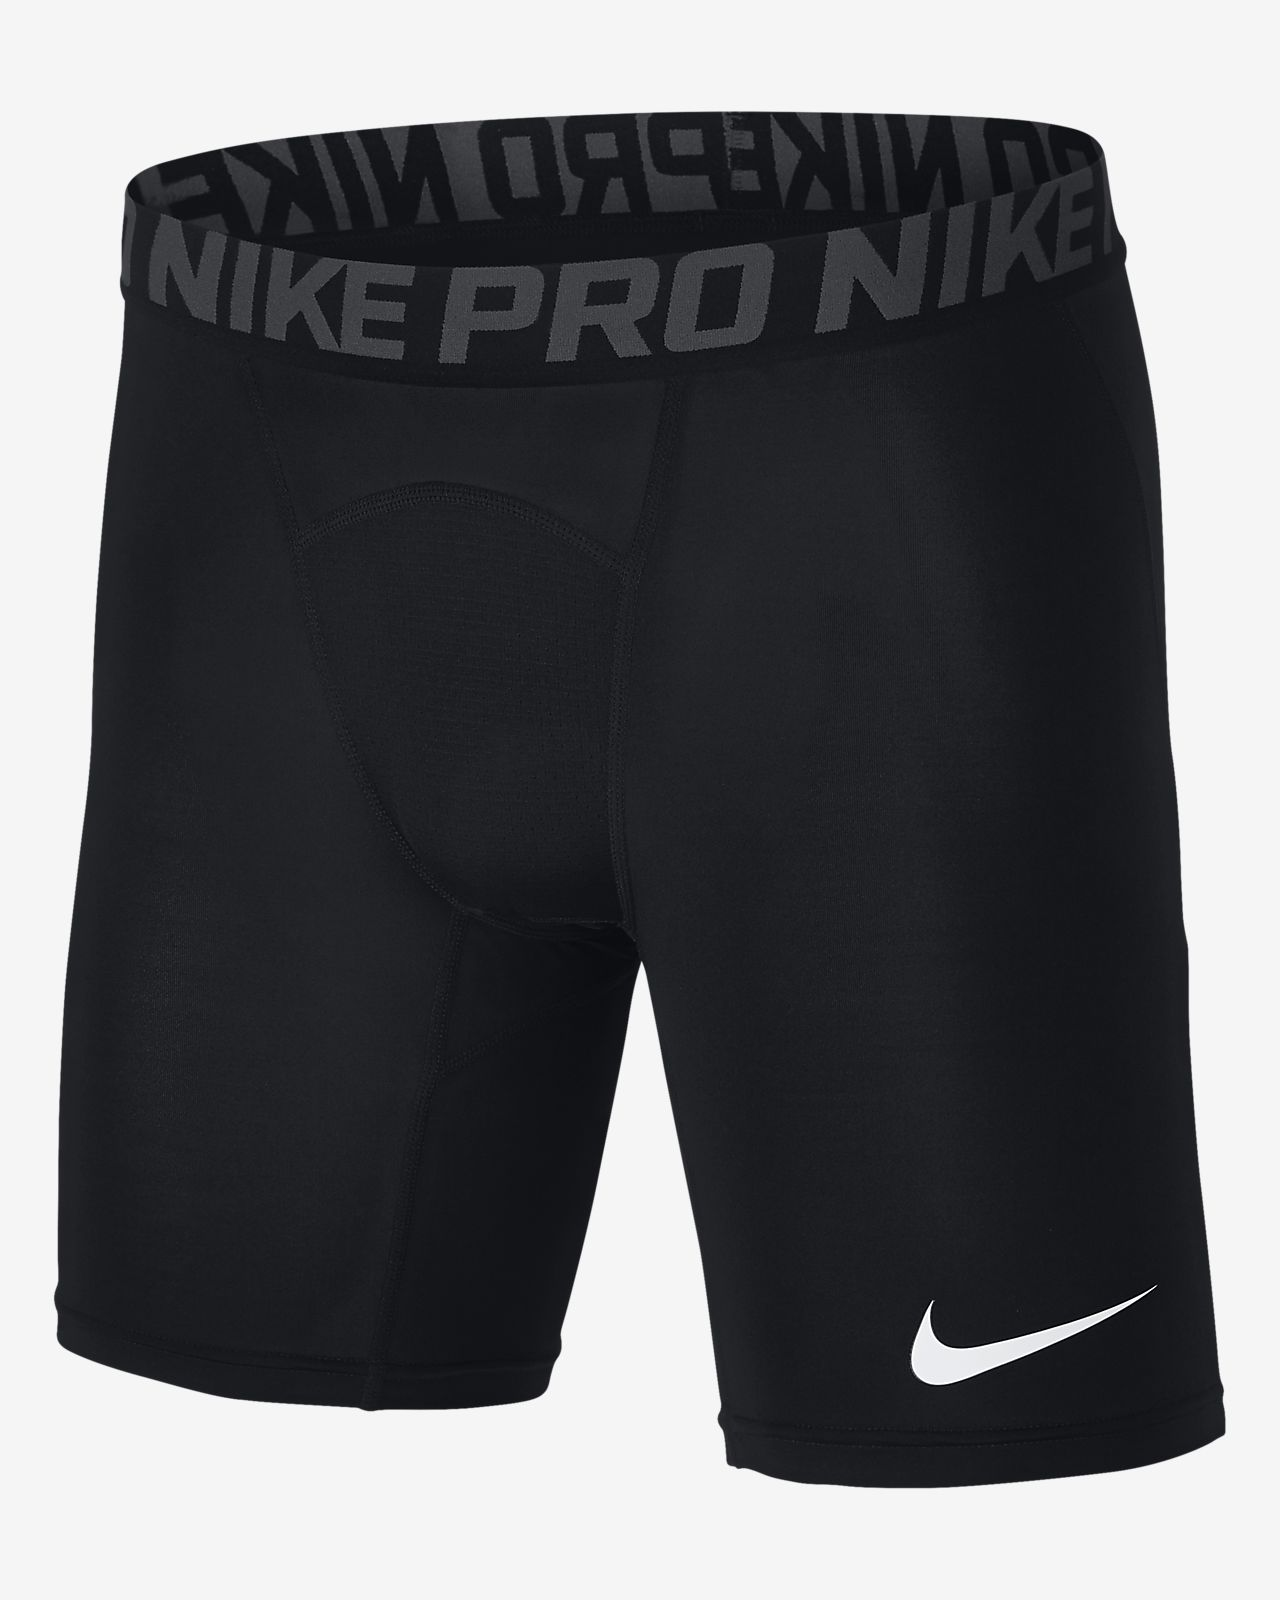 Nike Pro Herren-Trainingsshorts (ca. 15 cm)